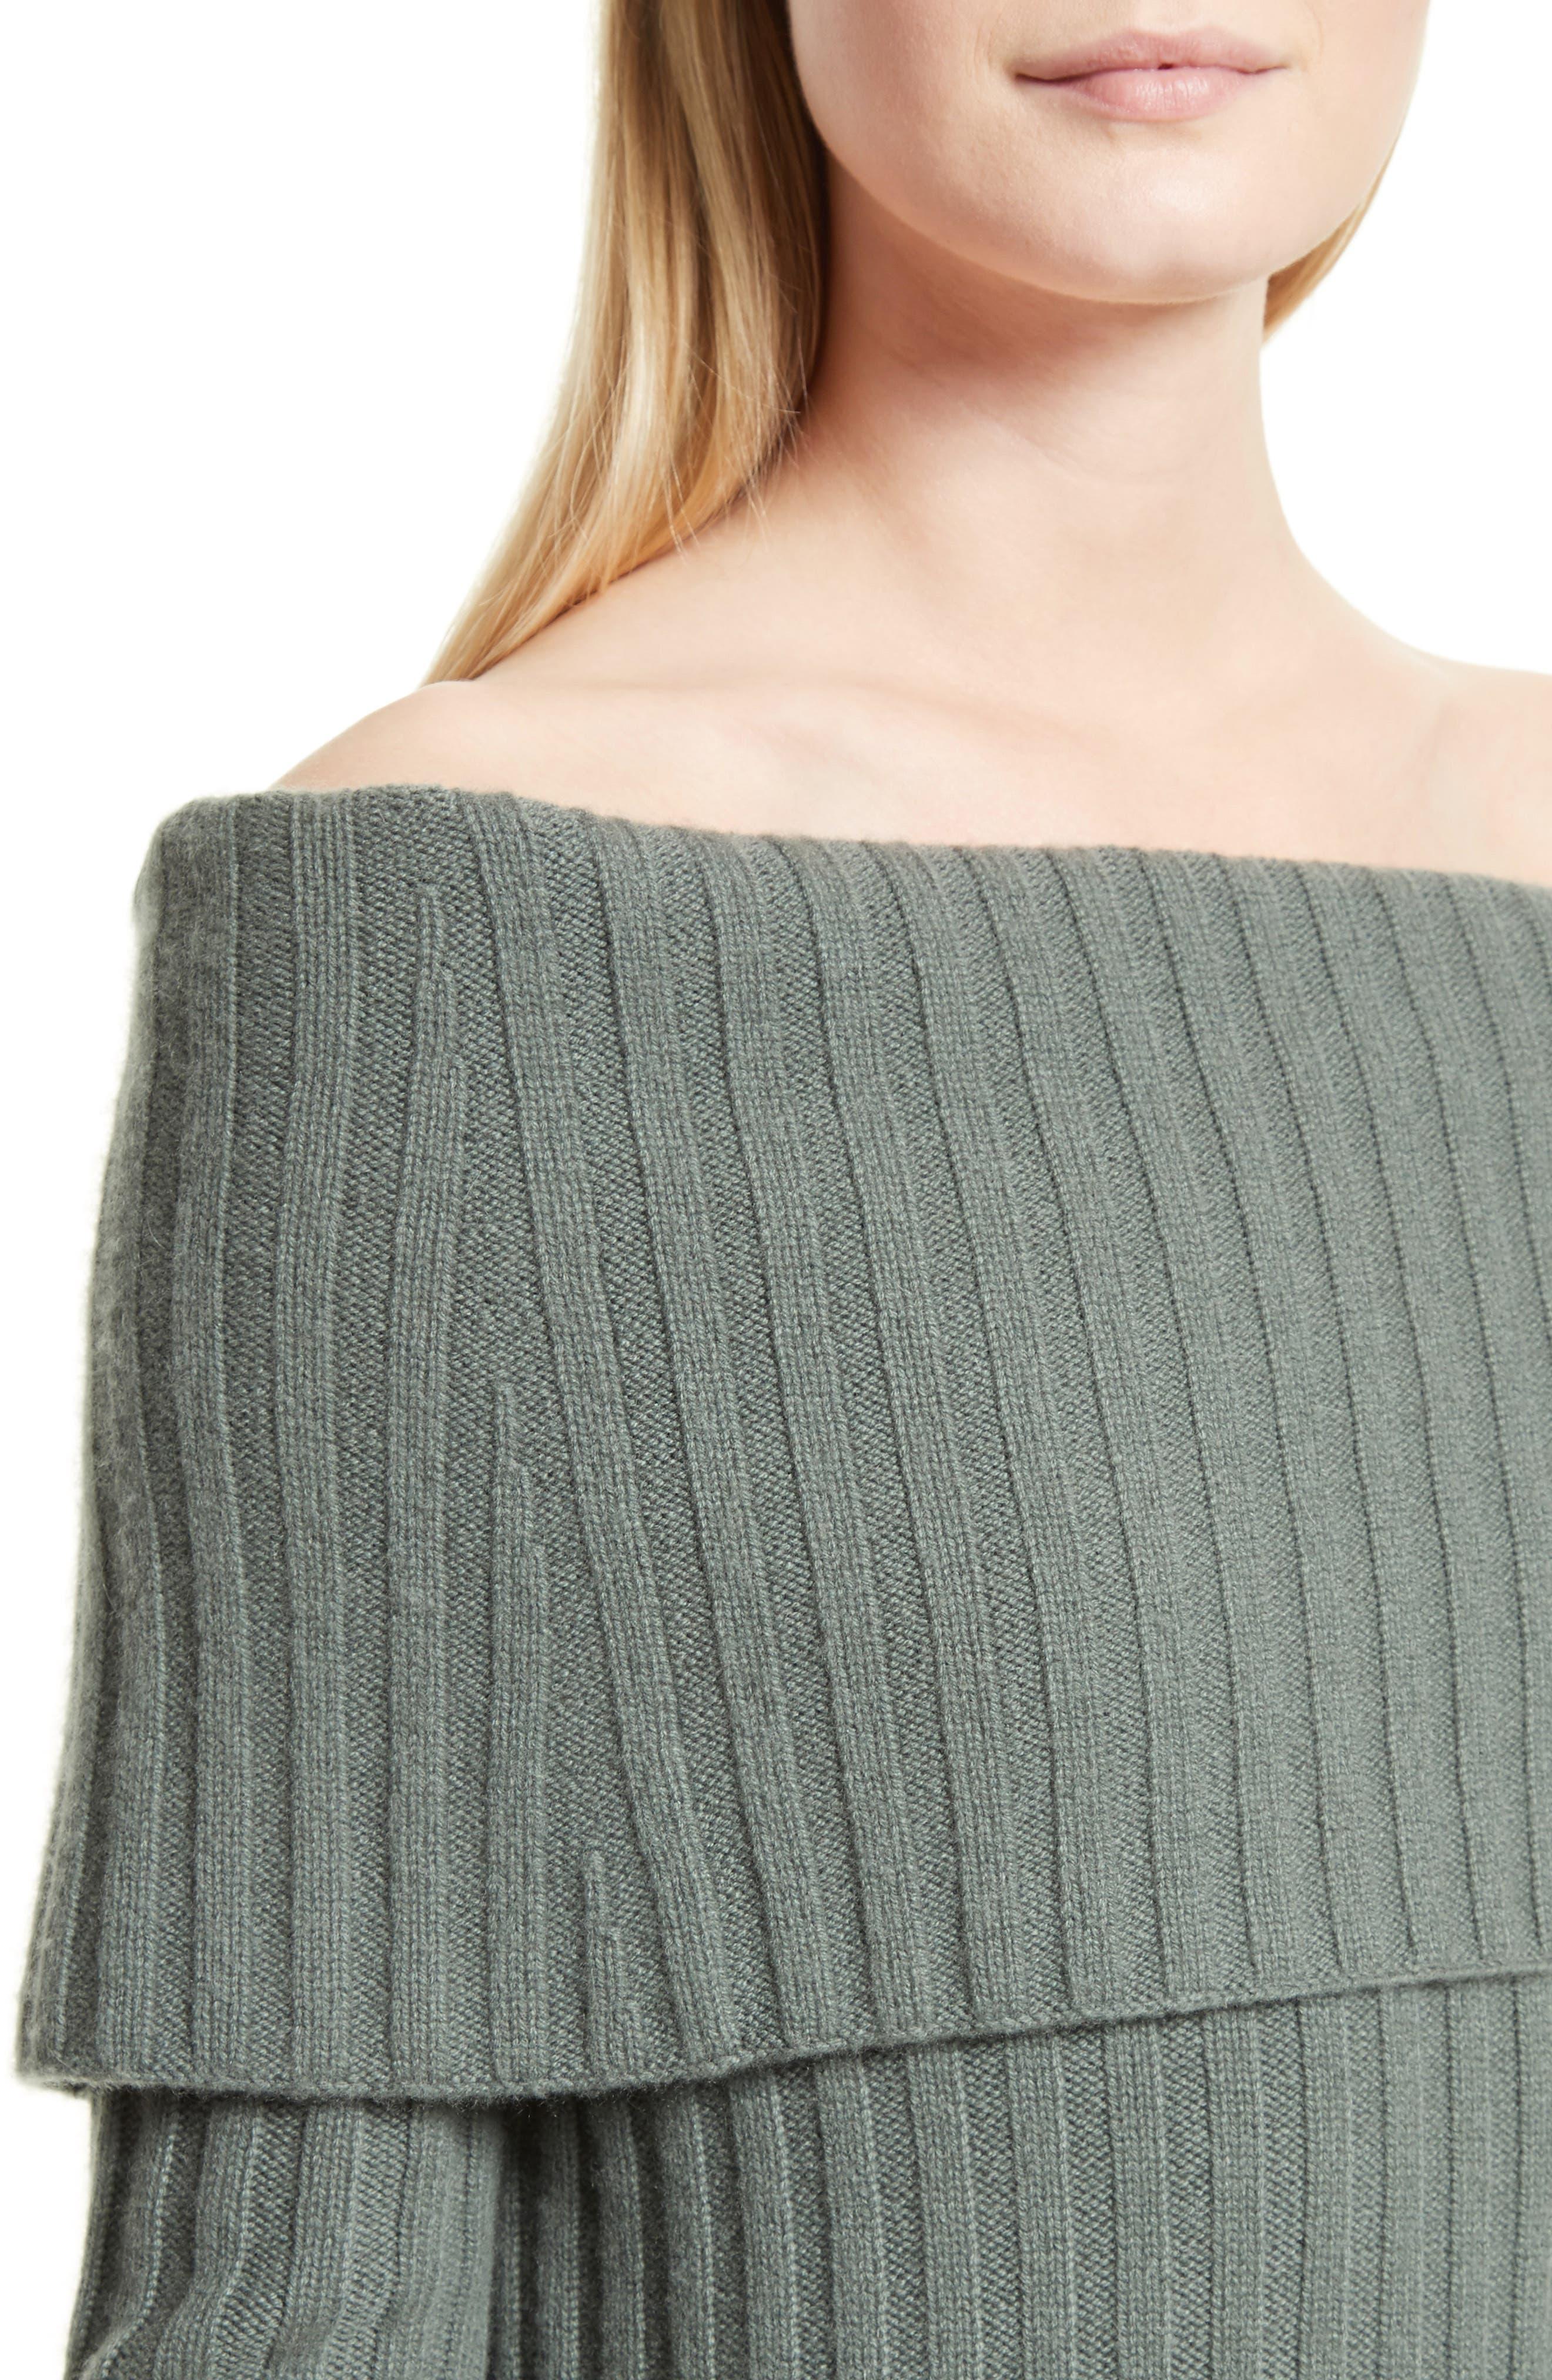 Off the Shoulder Cashmere Sweater,                             Alternate thumbnail 4, color,                             376